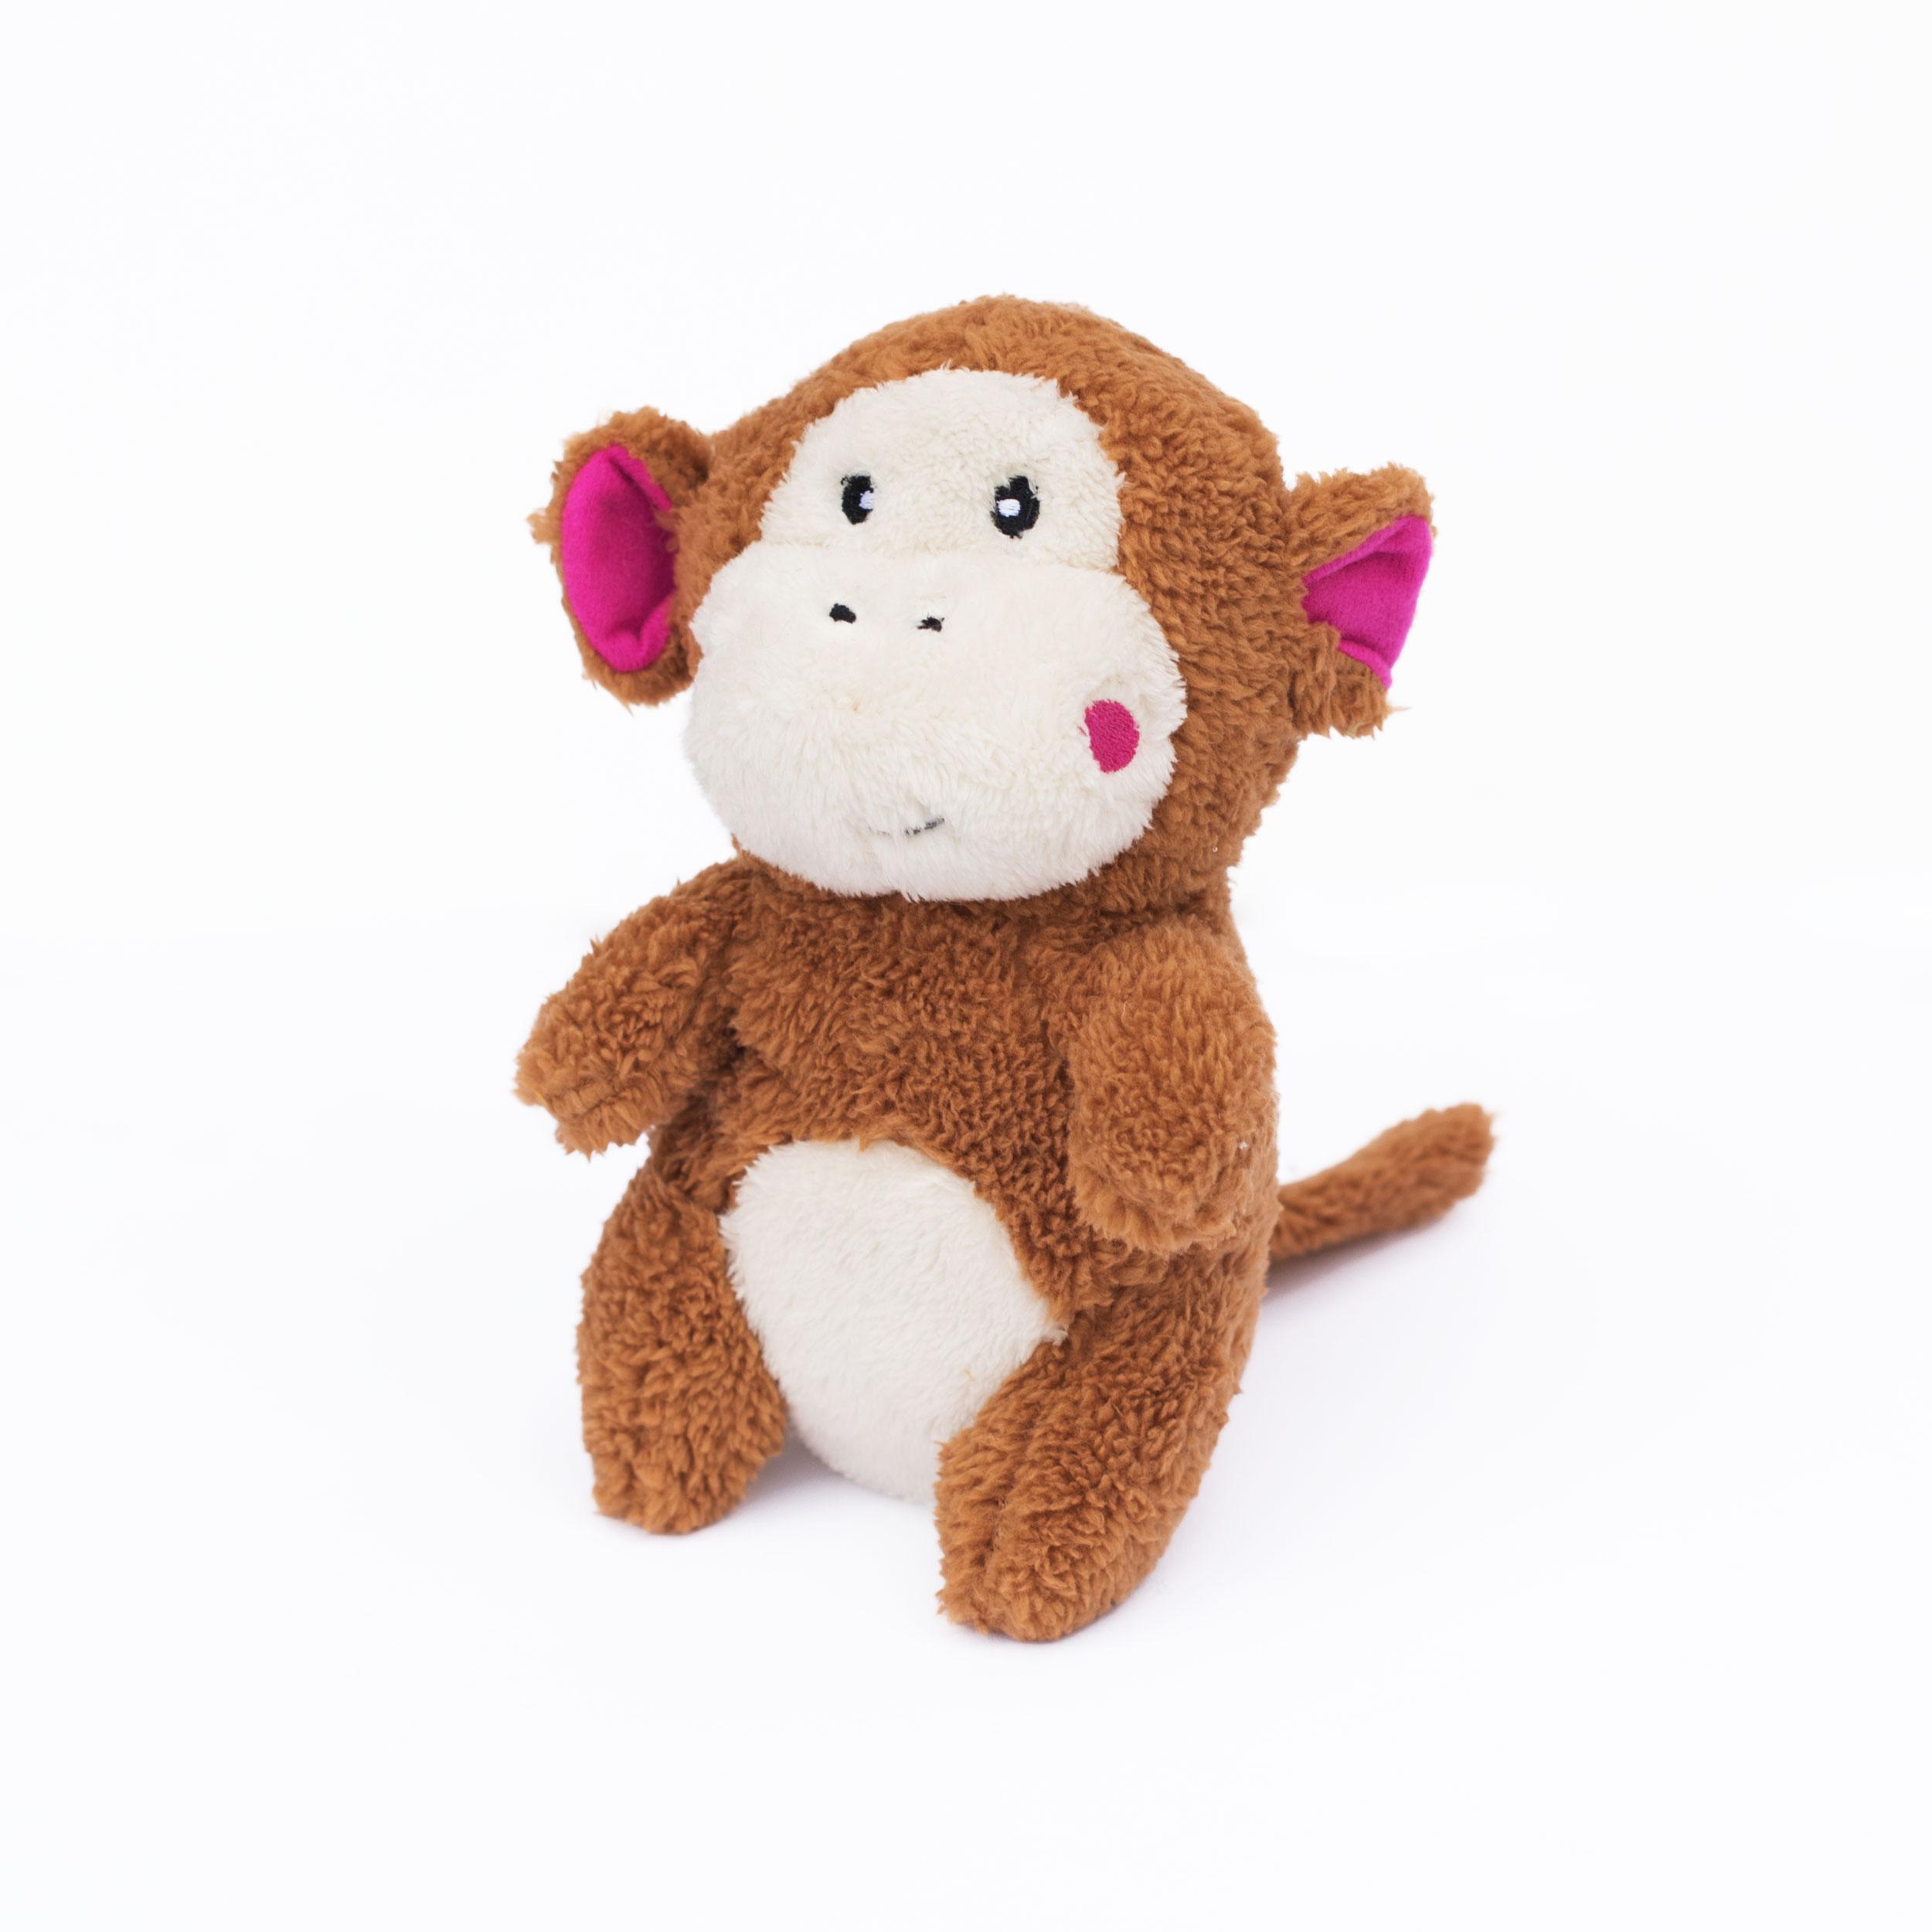 Cheeky Chumz - Monkey-0